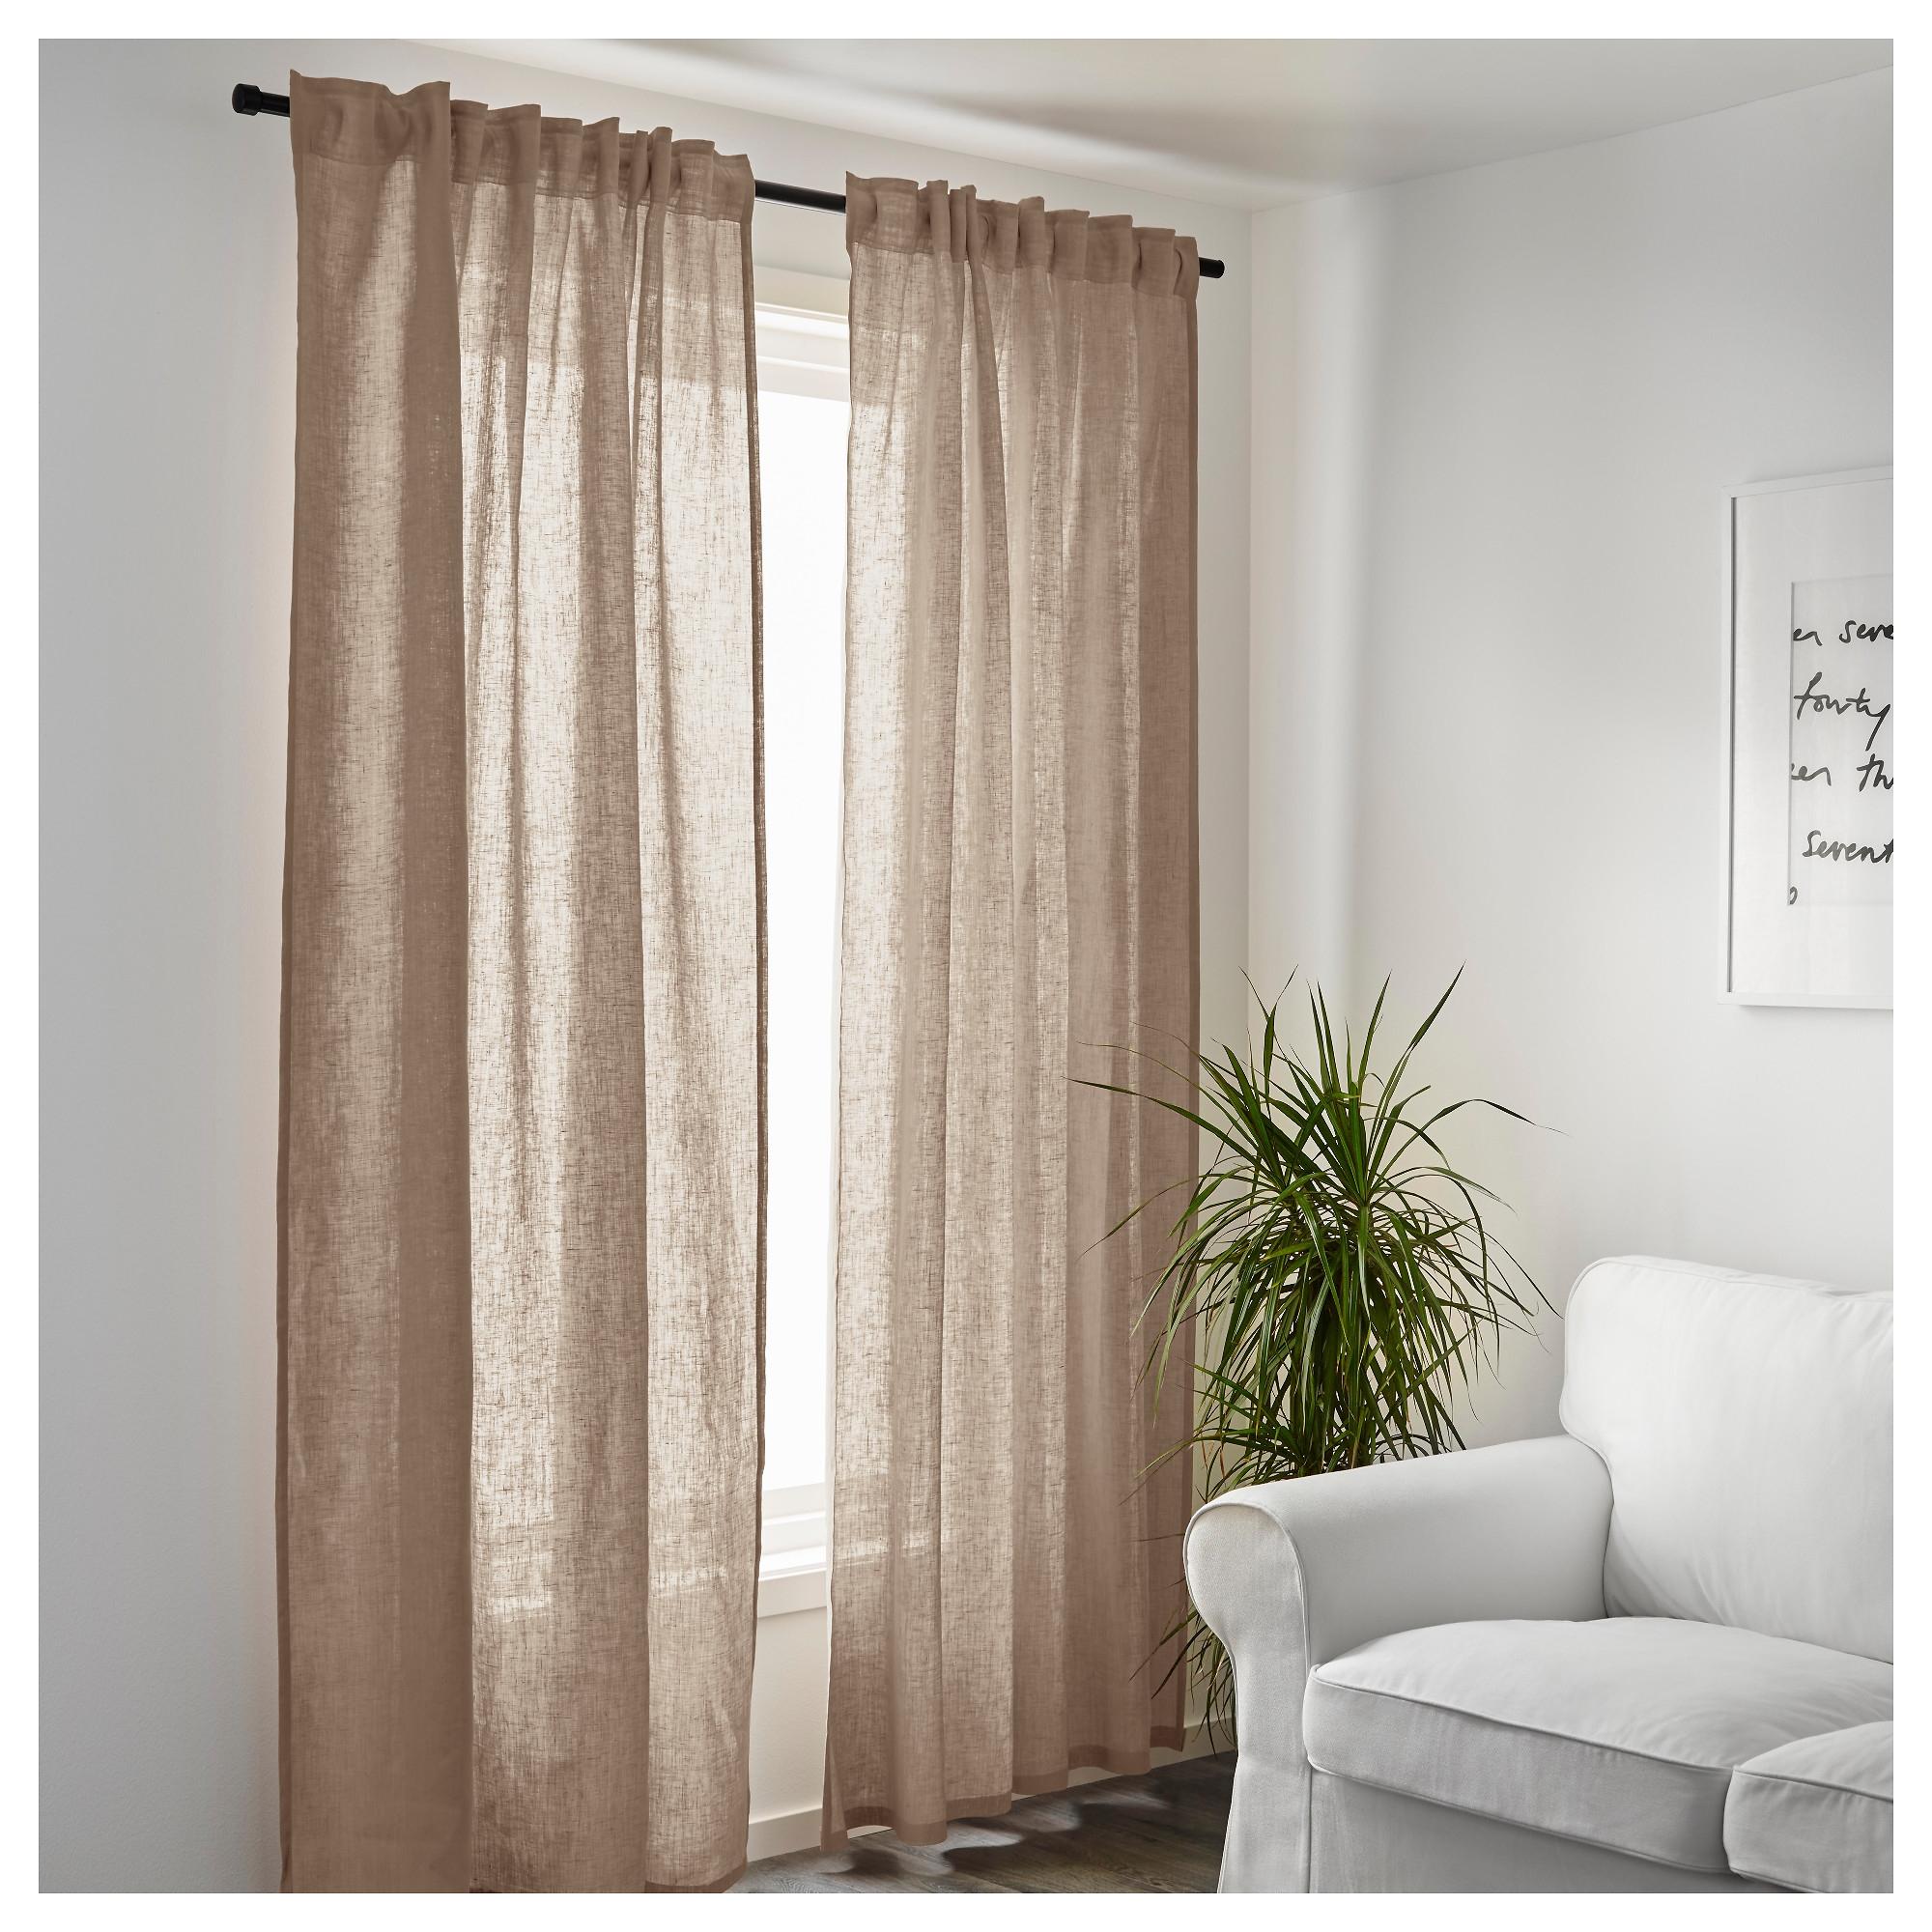 Aina Curtains 1 Pair Ikea Throughout Plain Linen Curtains (Photo 11 of 15)